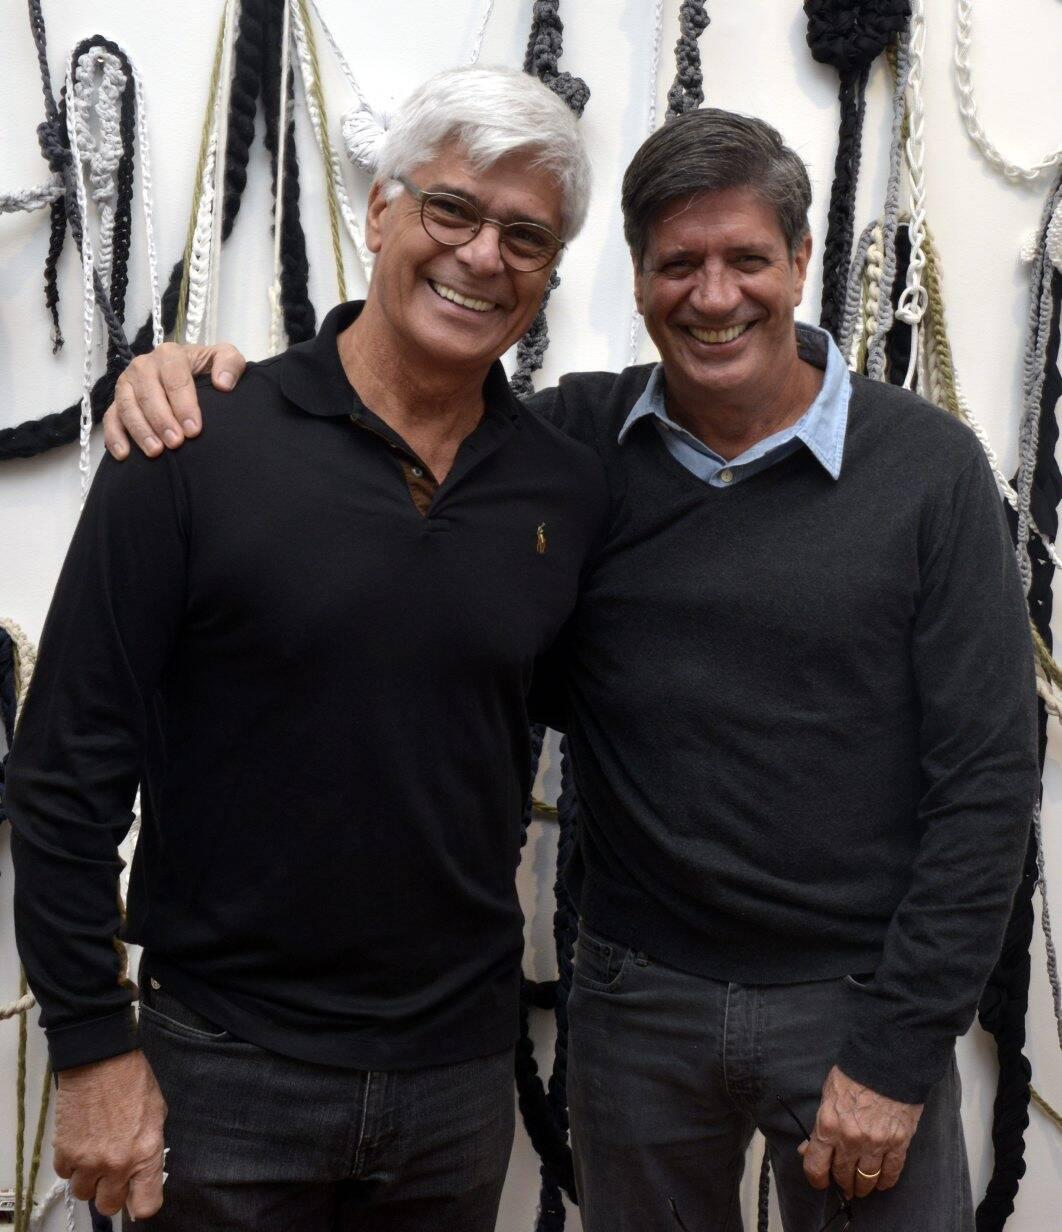 Nelson Leal e Sergio Serzedelo Machado